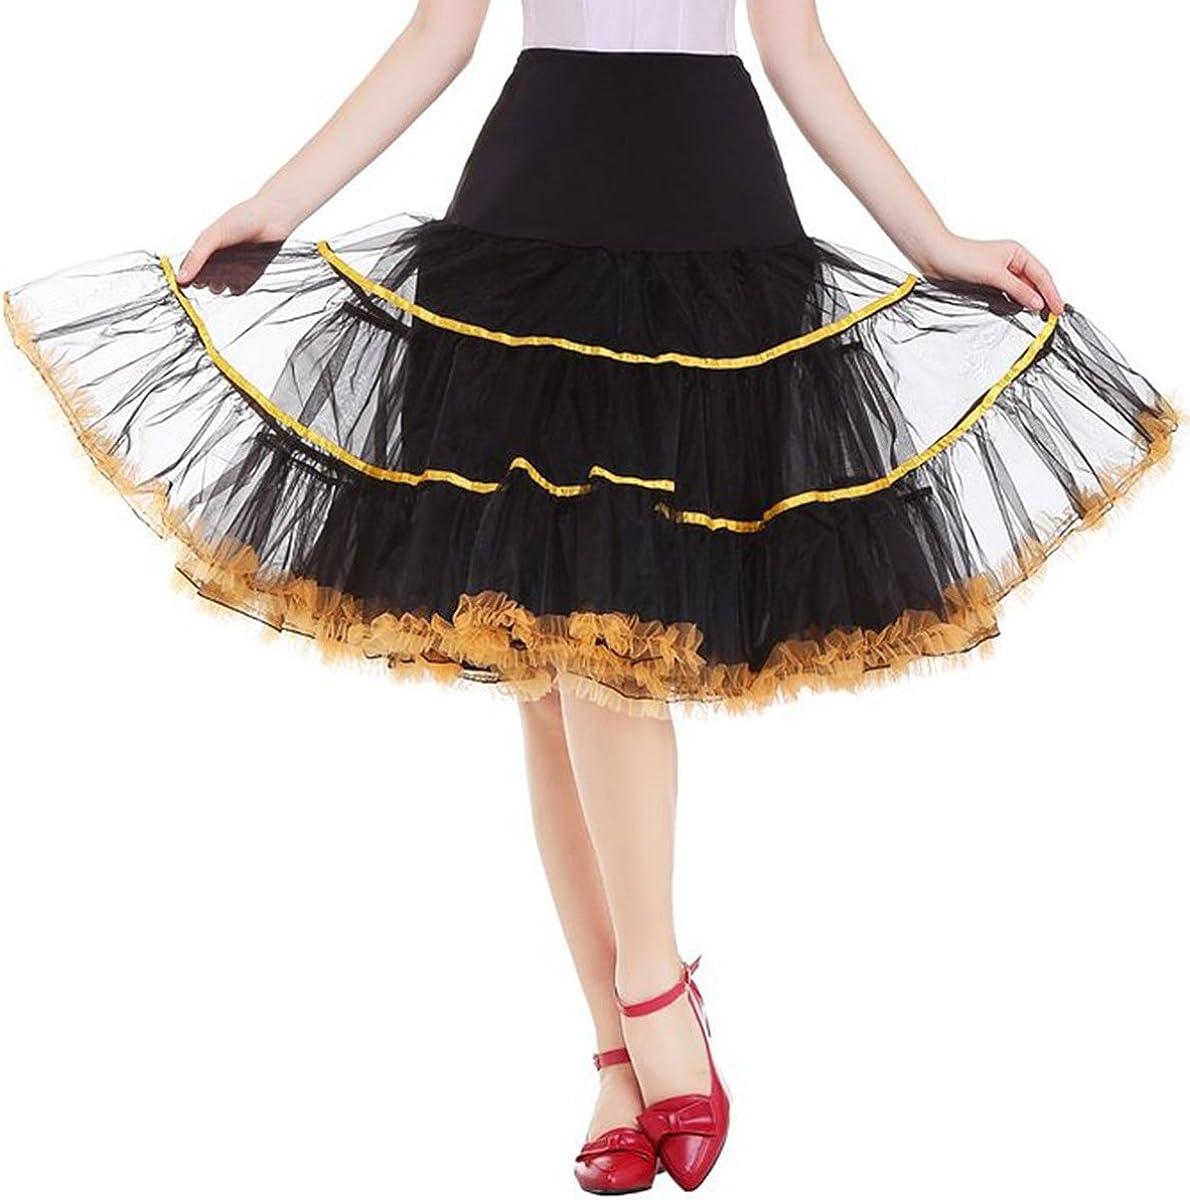 Quesera Womens 50s Vintage Rockabilly Petticoat Half Layered Striped Underskirt